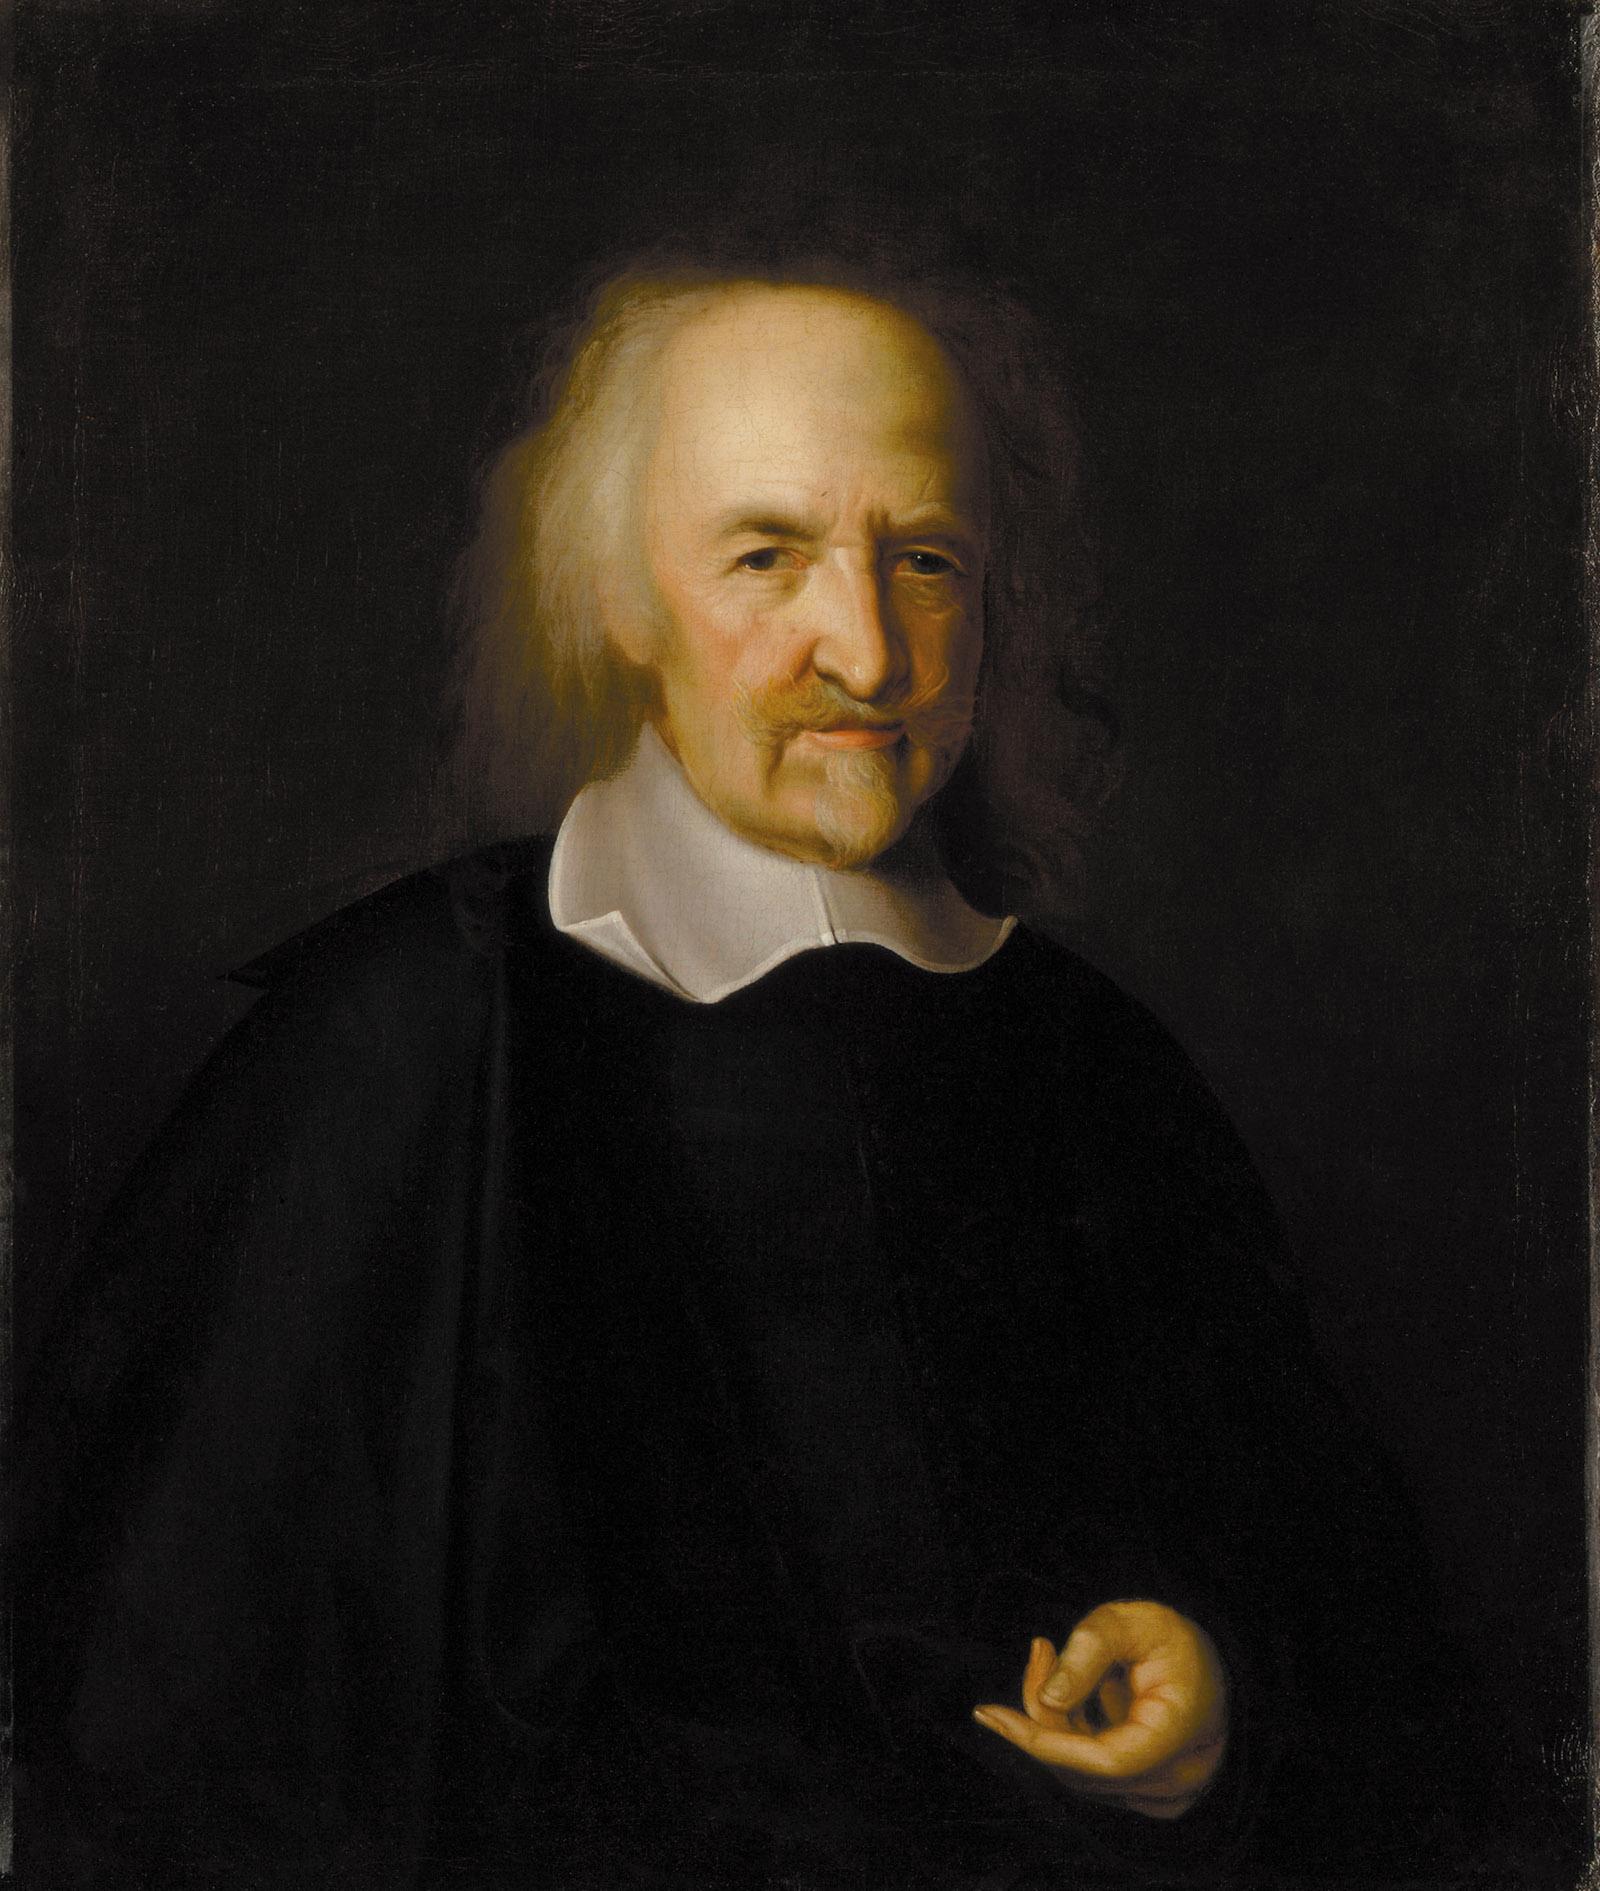 Thomas Hobbes; portrait by John Michael Wright, circa 1669–1670